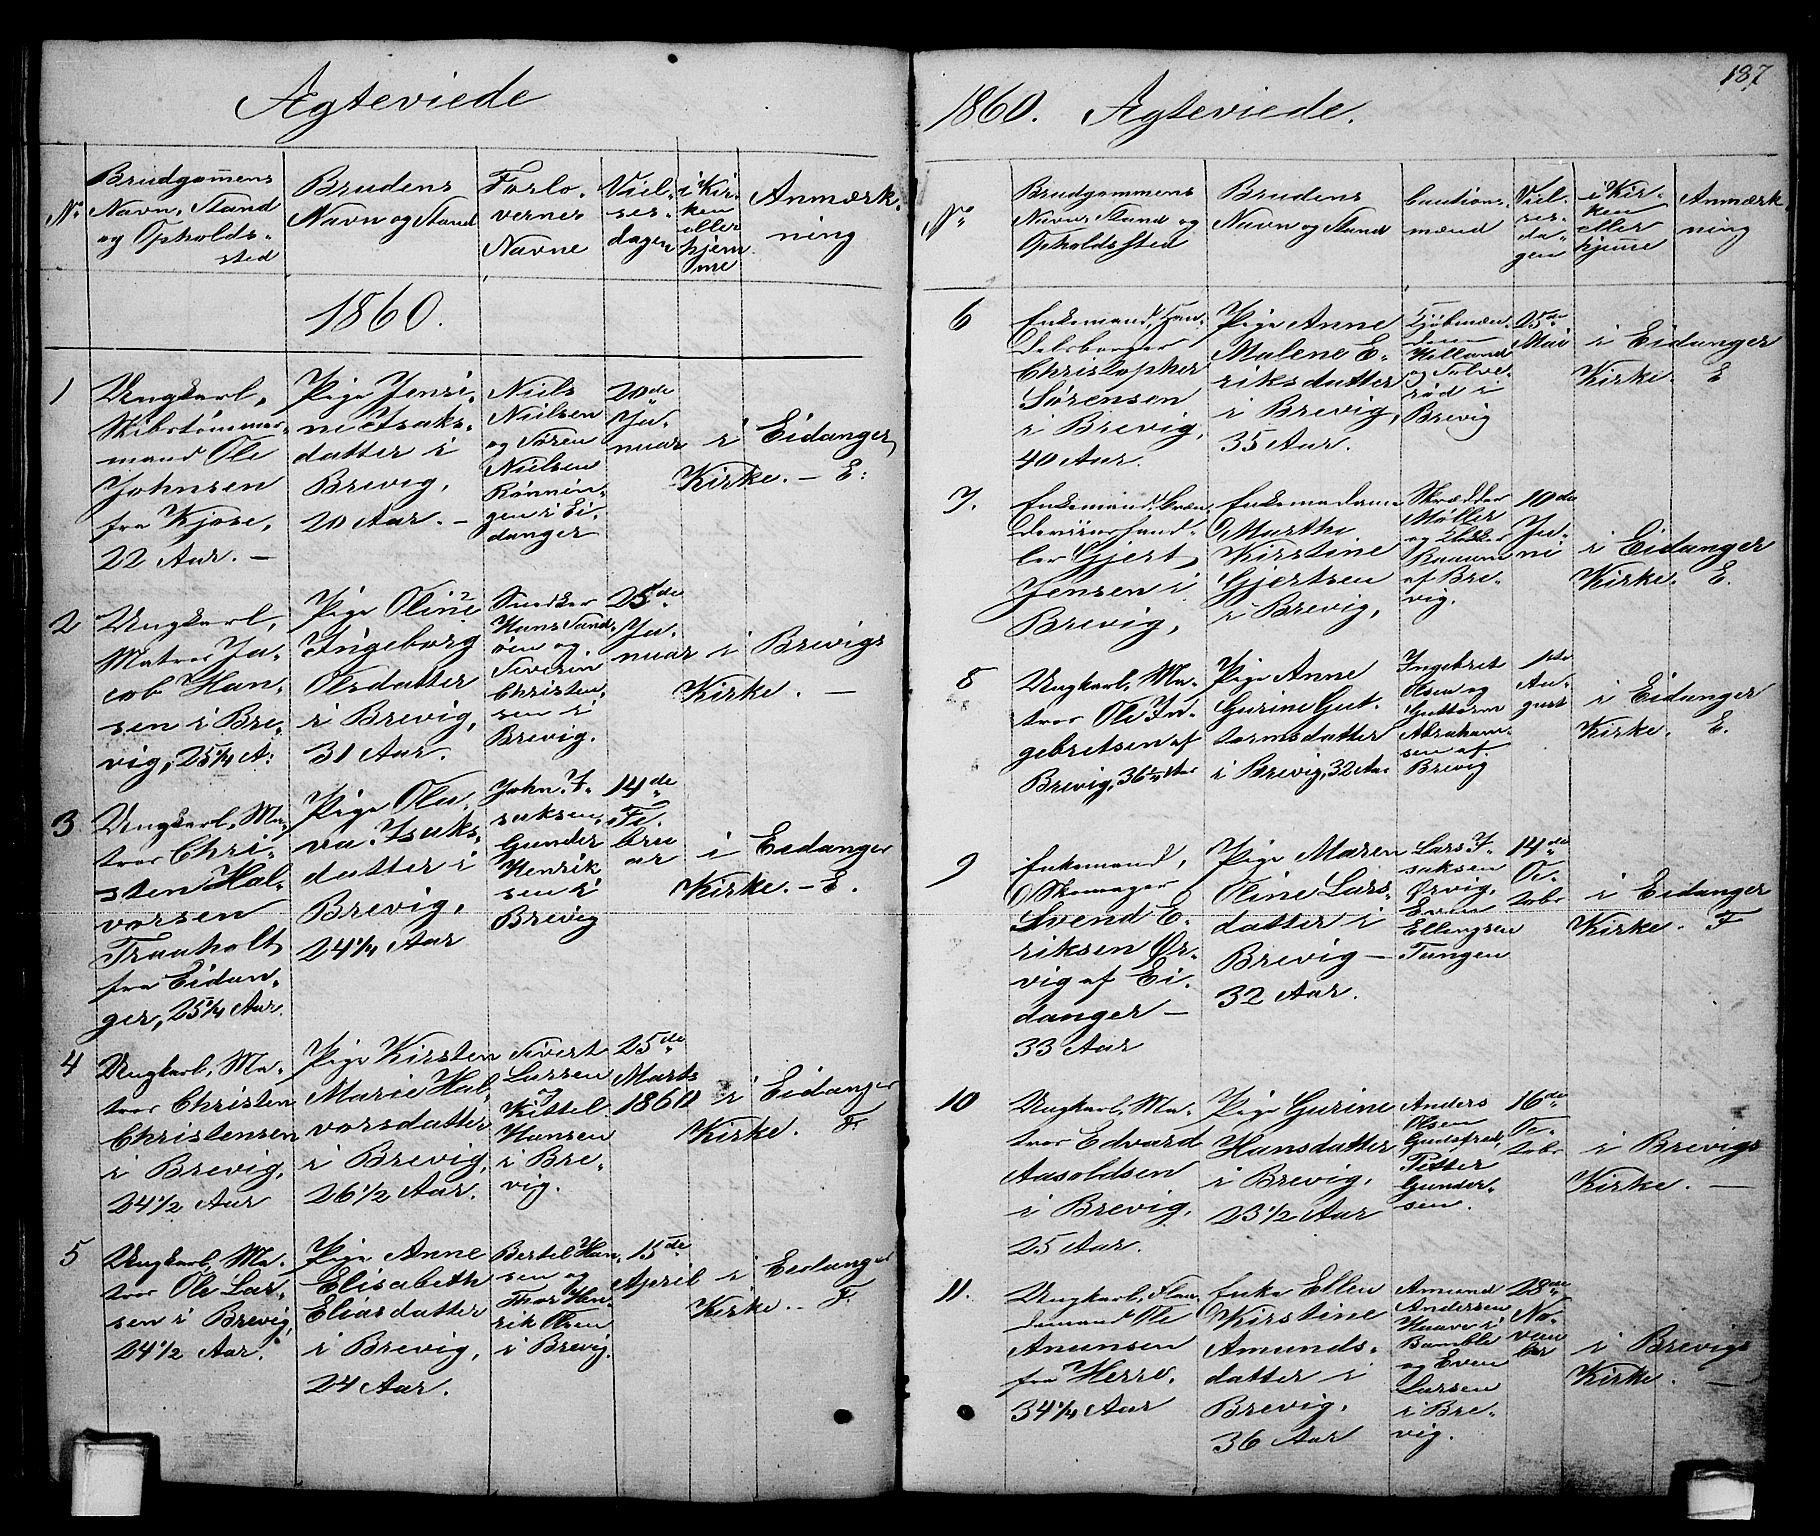 SAKO, Brevik kirkebøker, G/Ga/L0002: Klokkerbok nr. 2, 1846-1865, s. 187